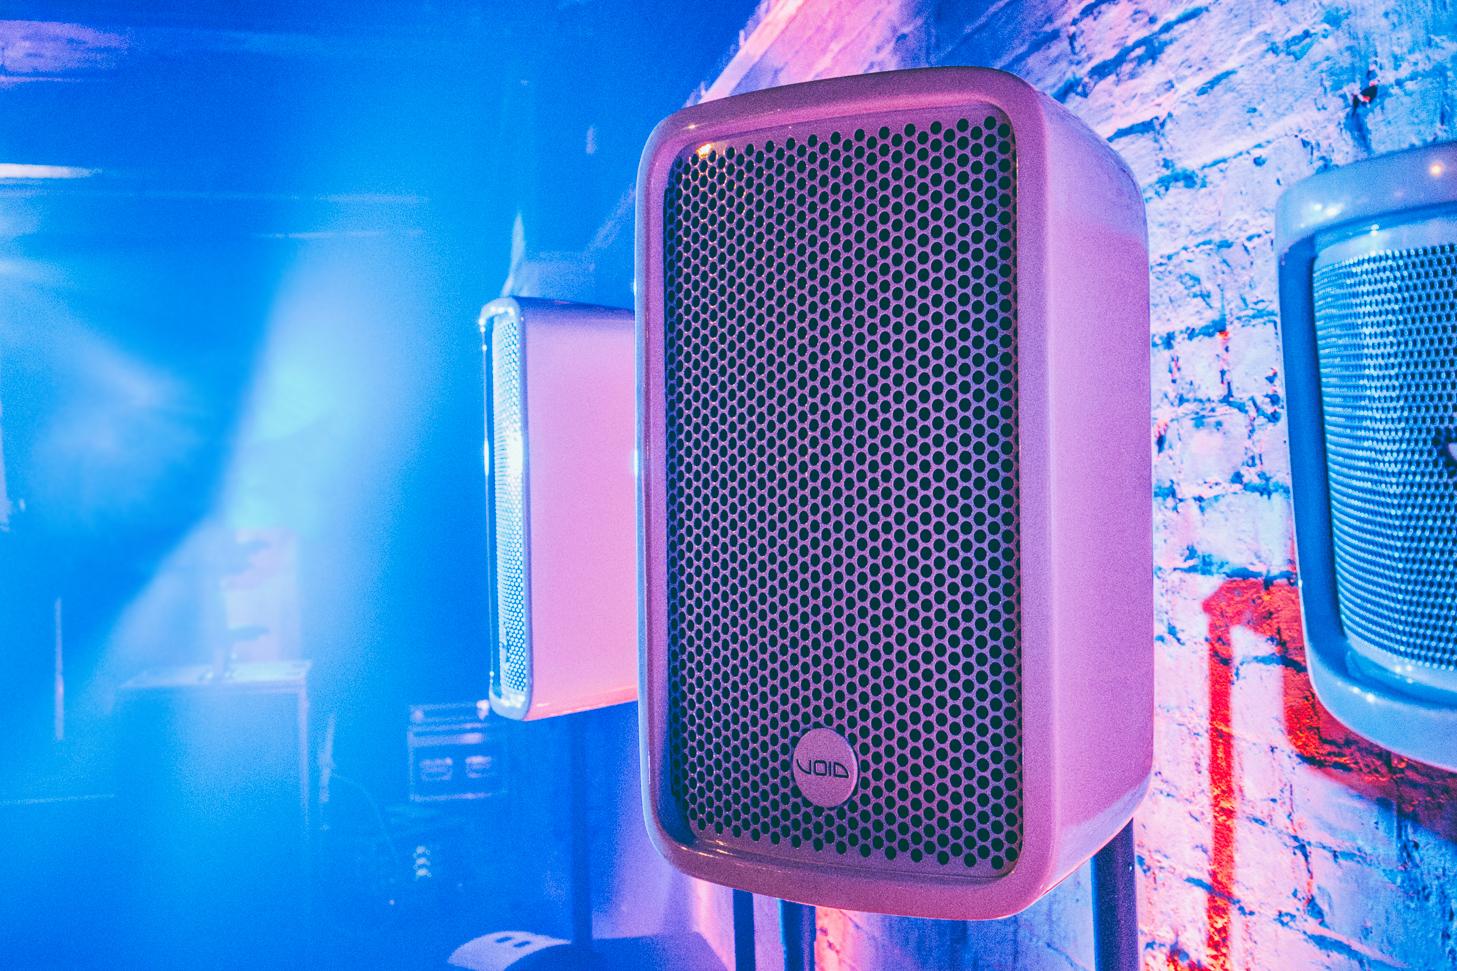 Void Acoustics Cyclone 10 speakers